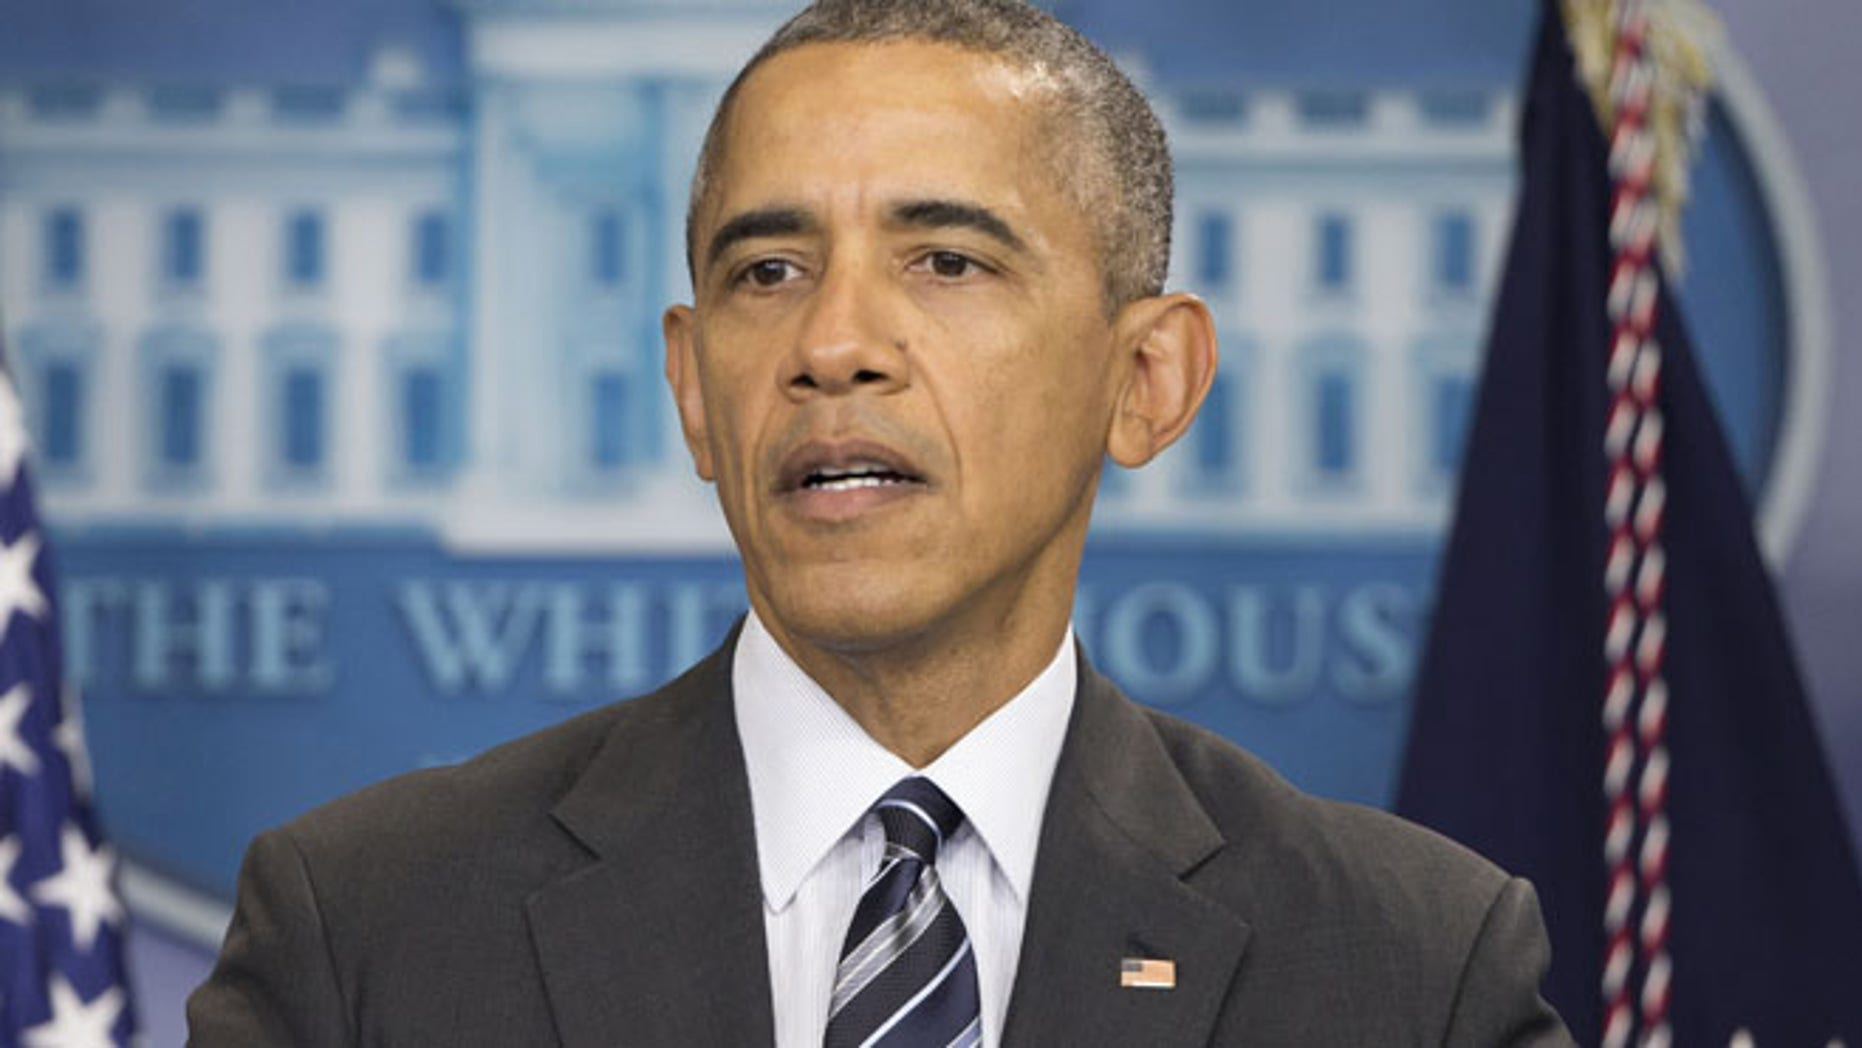 Feb. 5, 2016: President Barack Obama speaks in the Brady Press Briefing Room of the White House in Washington.